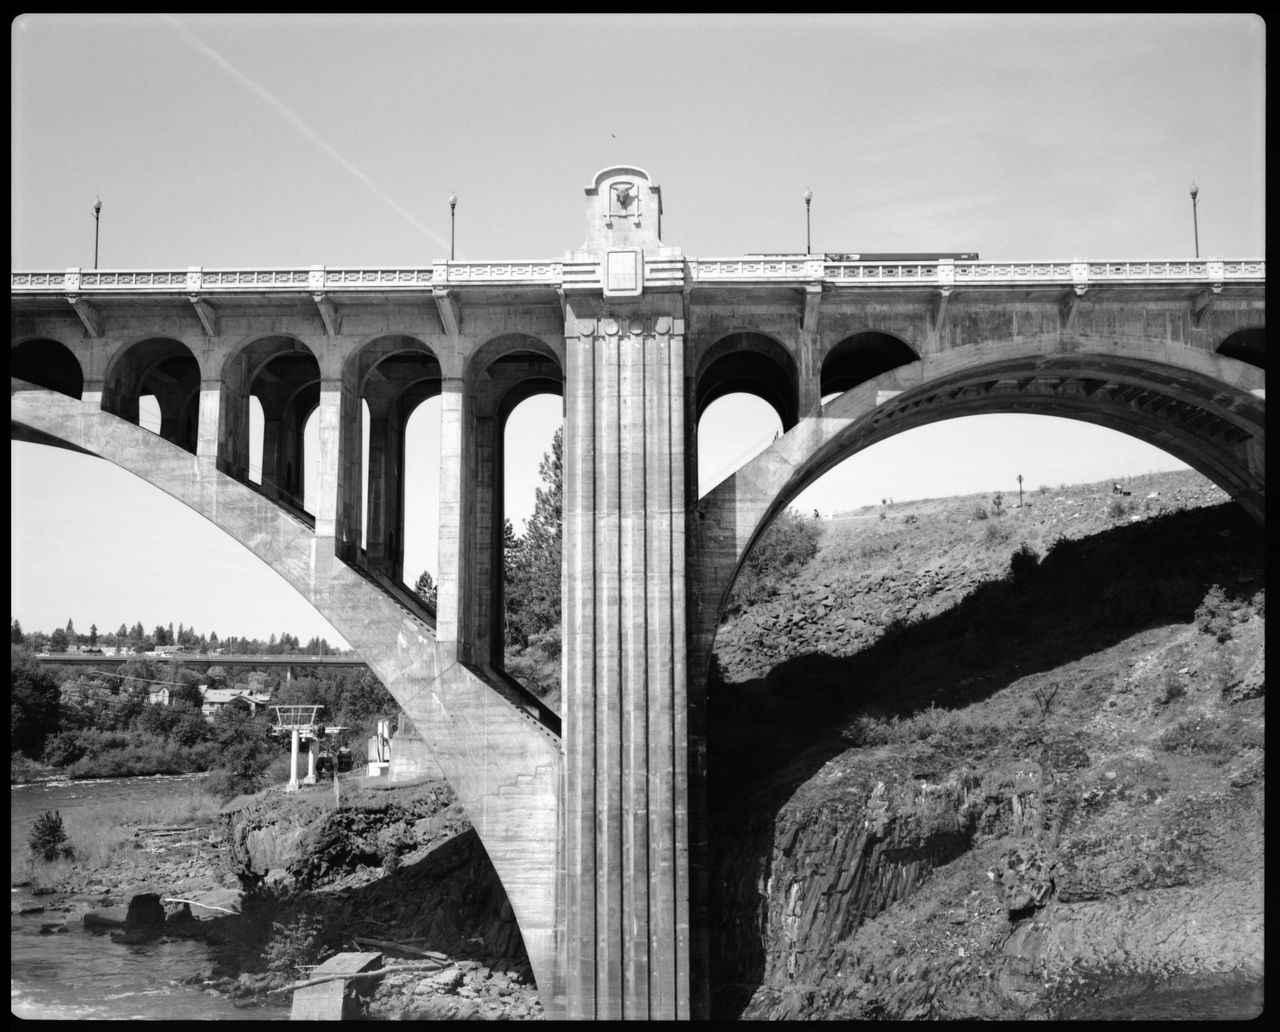 Spokane Water Company American Architecture Americana Architecture Bridge Concrete Bridge Energy Force Of Water Great Bridge Great Bridge Hydroenergy Nature No People Spokane Spokane Bridge Spokane Water Company Stone Bridge Travel Washington State Waterfall